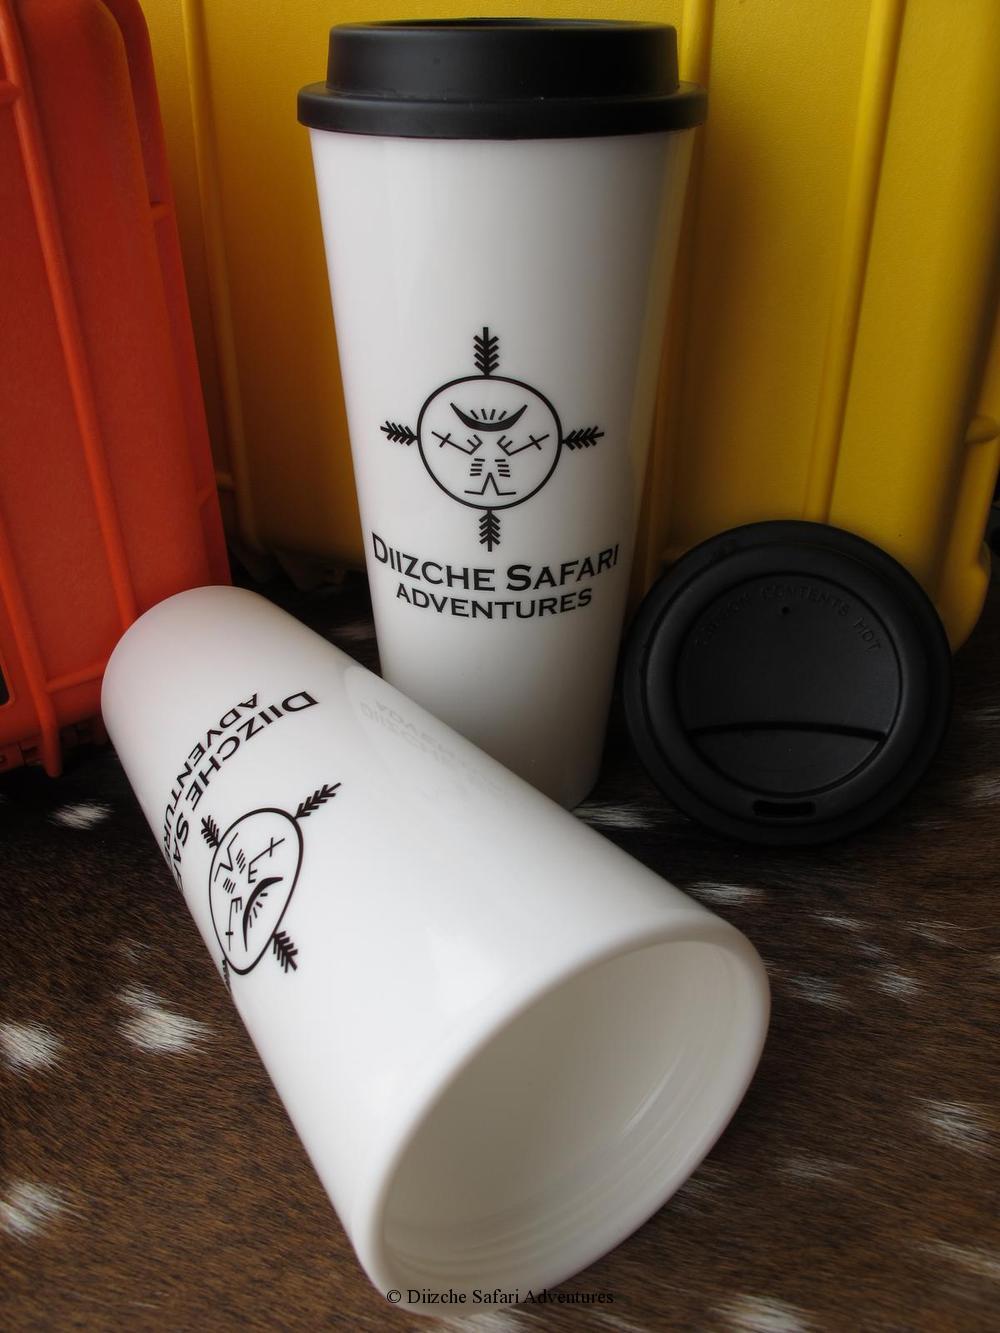 Heavy Duty 20 Oz. White Plastic Cup2goTwo Black Diizche Safari Adventures Logos 20 Oz. Heavy Duty Cup2go Dual Logo Design Diizche Safari Adventures, watch cover, cap, medicine bag Diizche Safari Adventures, ultimate bore protection